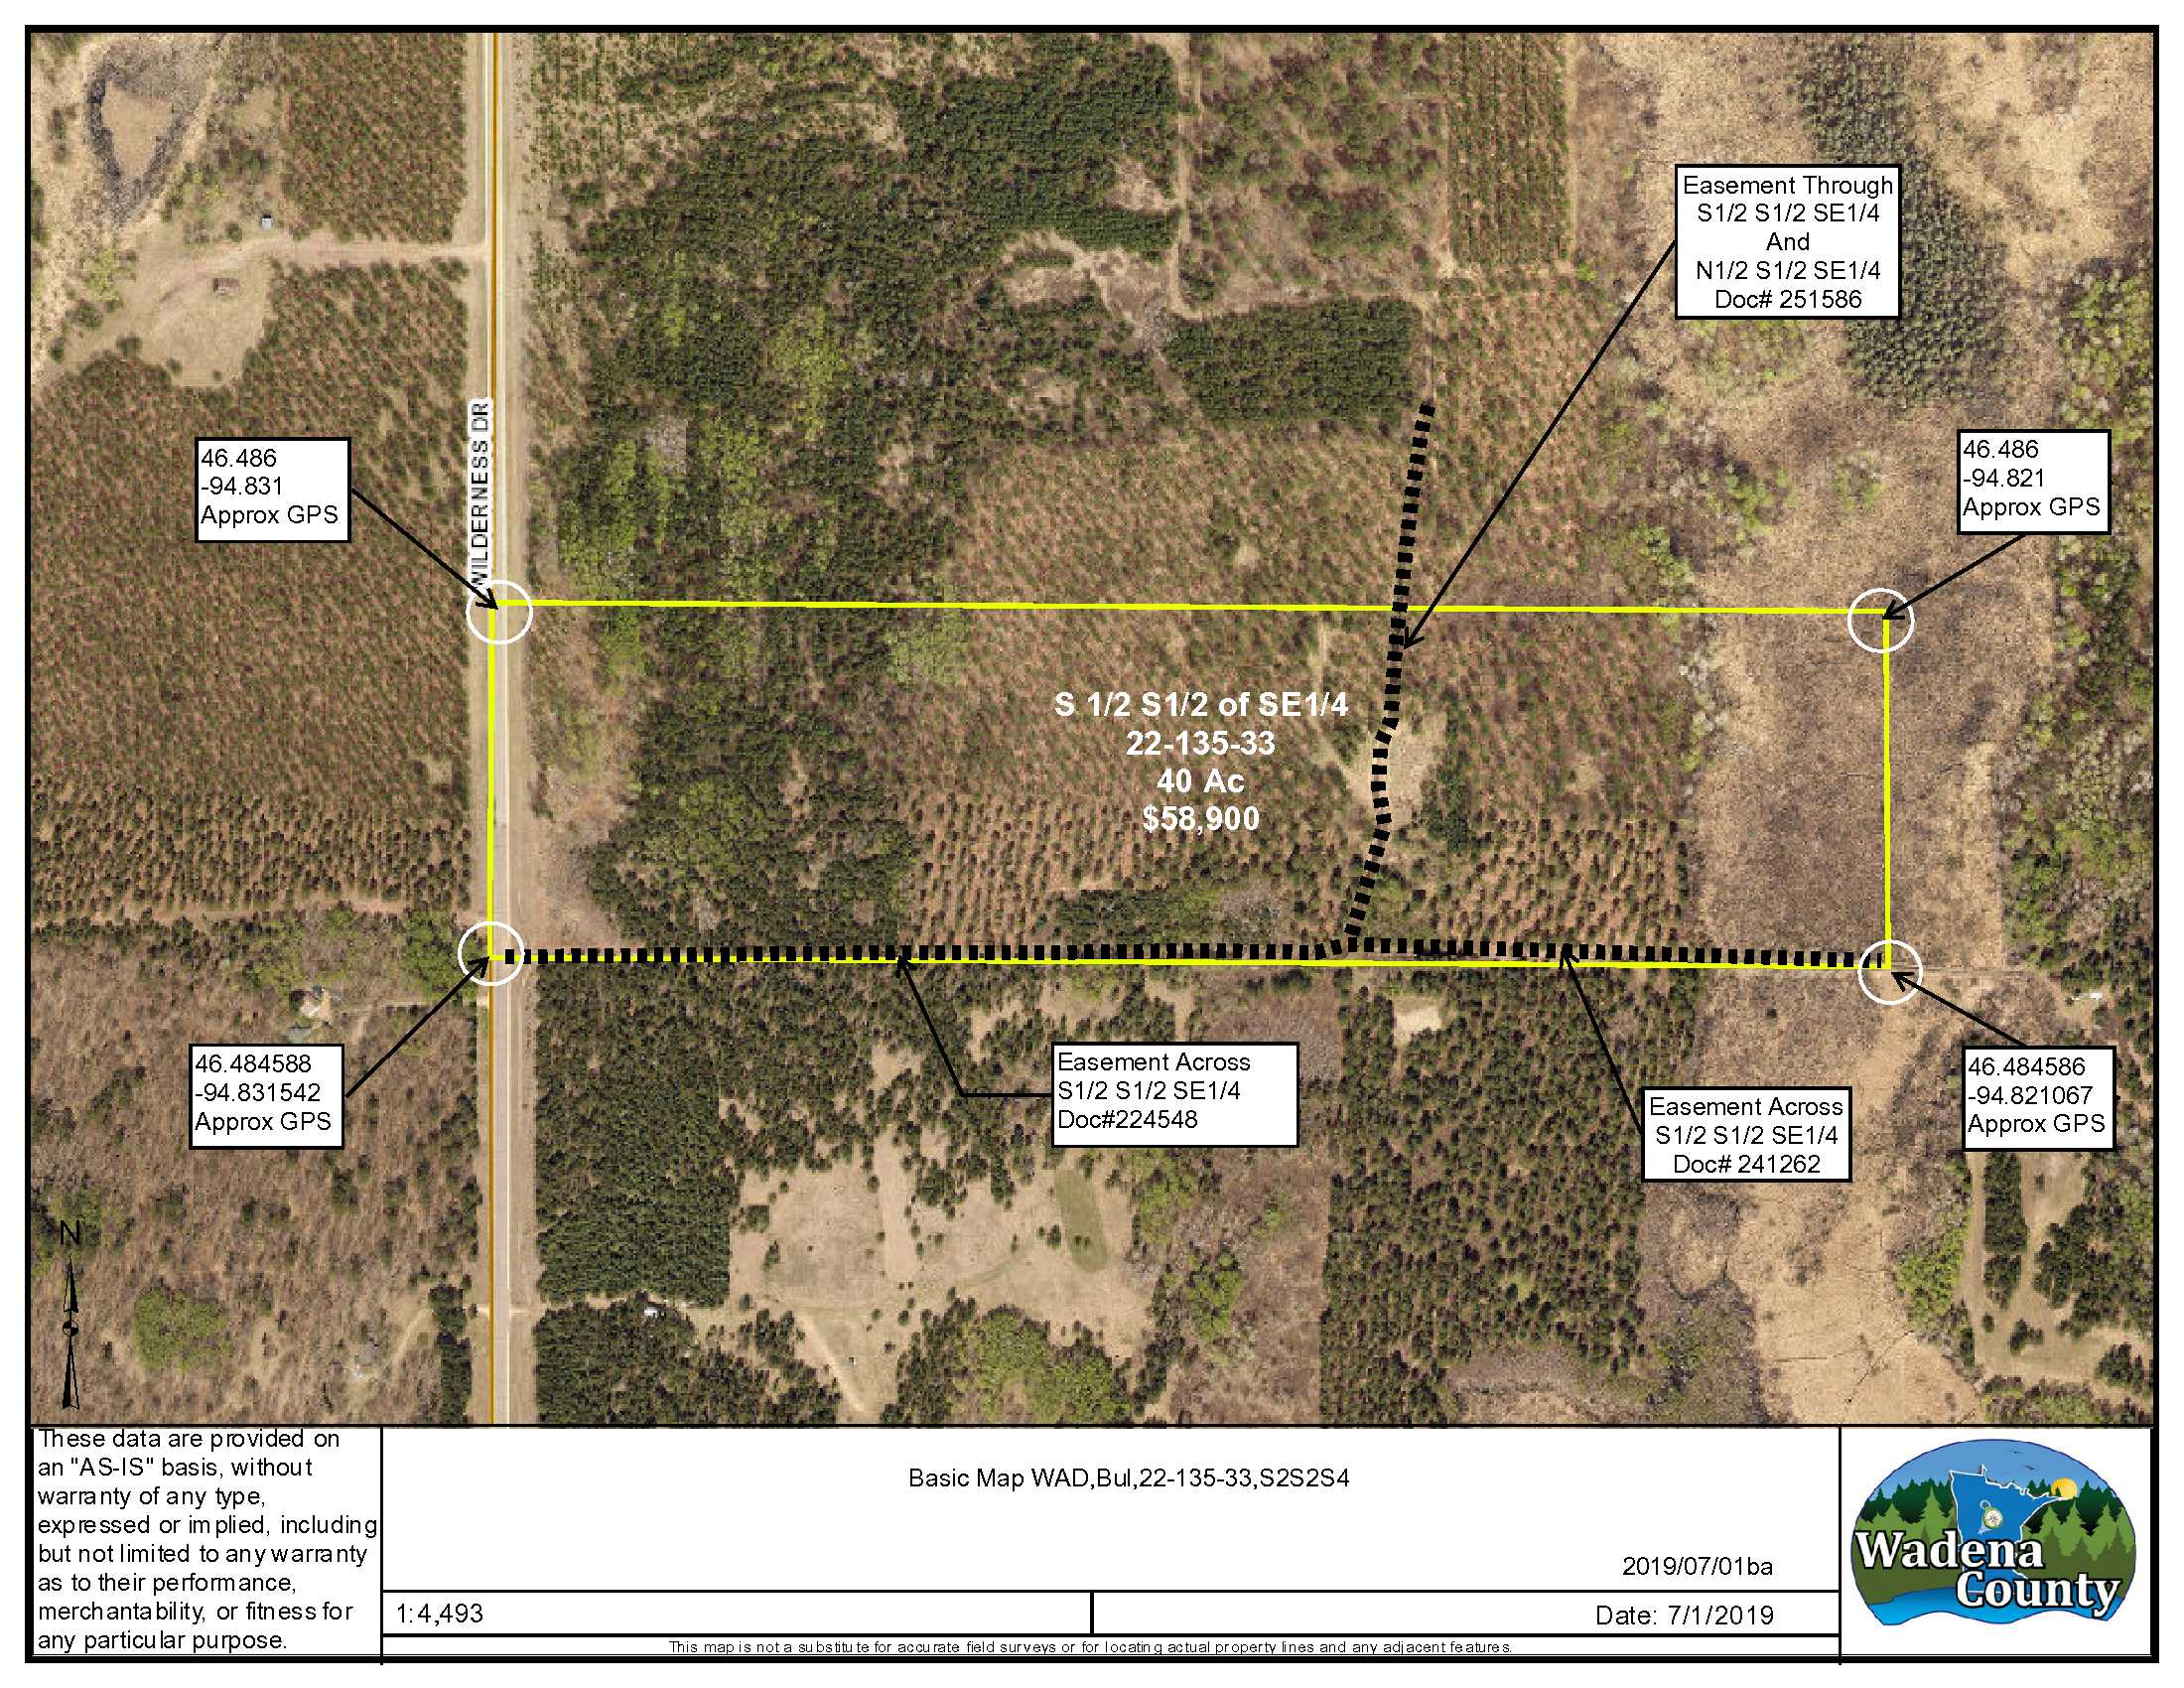 S½, S½, SE¼ Wilderness Dr., Bullard Twp., Staples, Wadena County